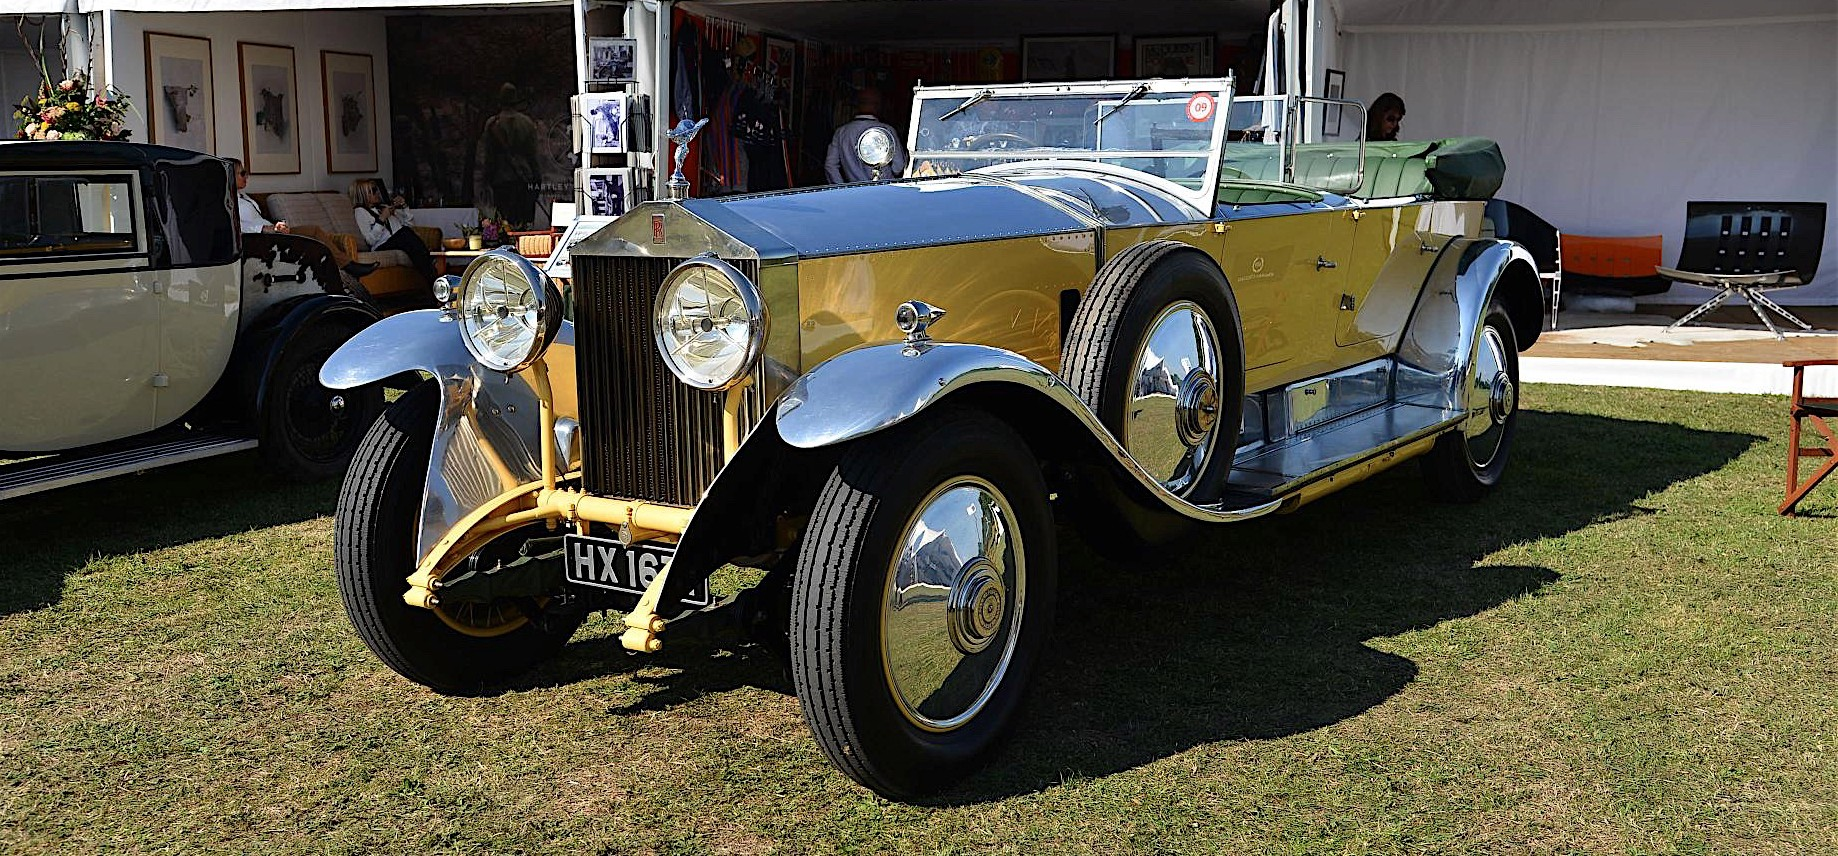 The Astonishing History of the RollsRoyce Phantom  autoevolution